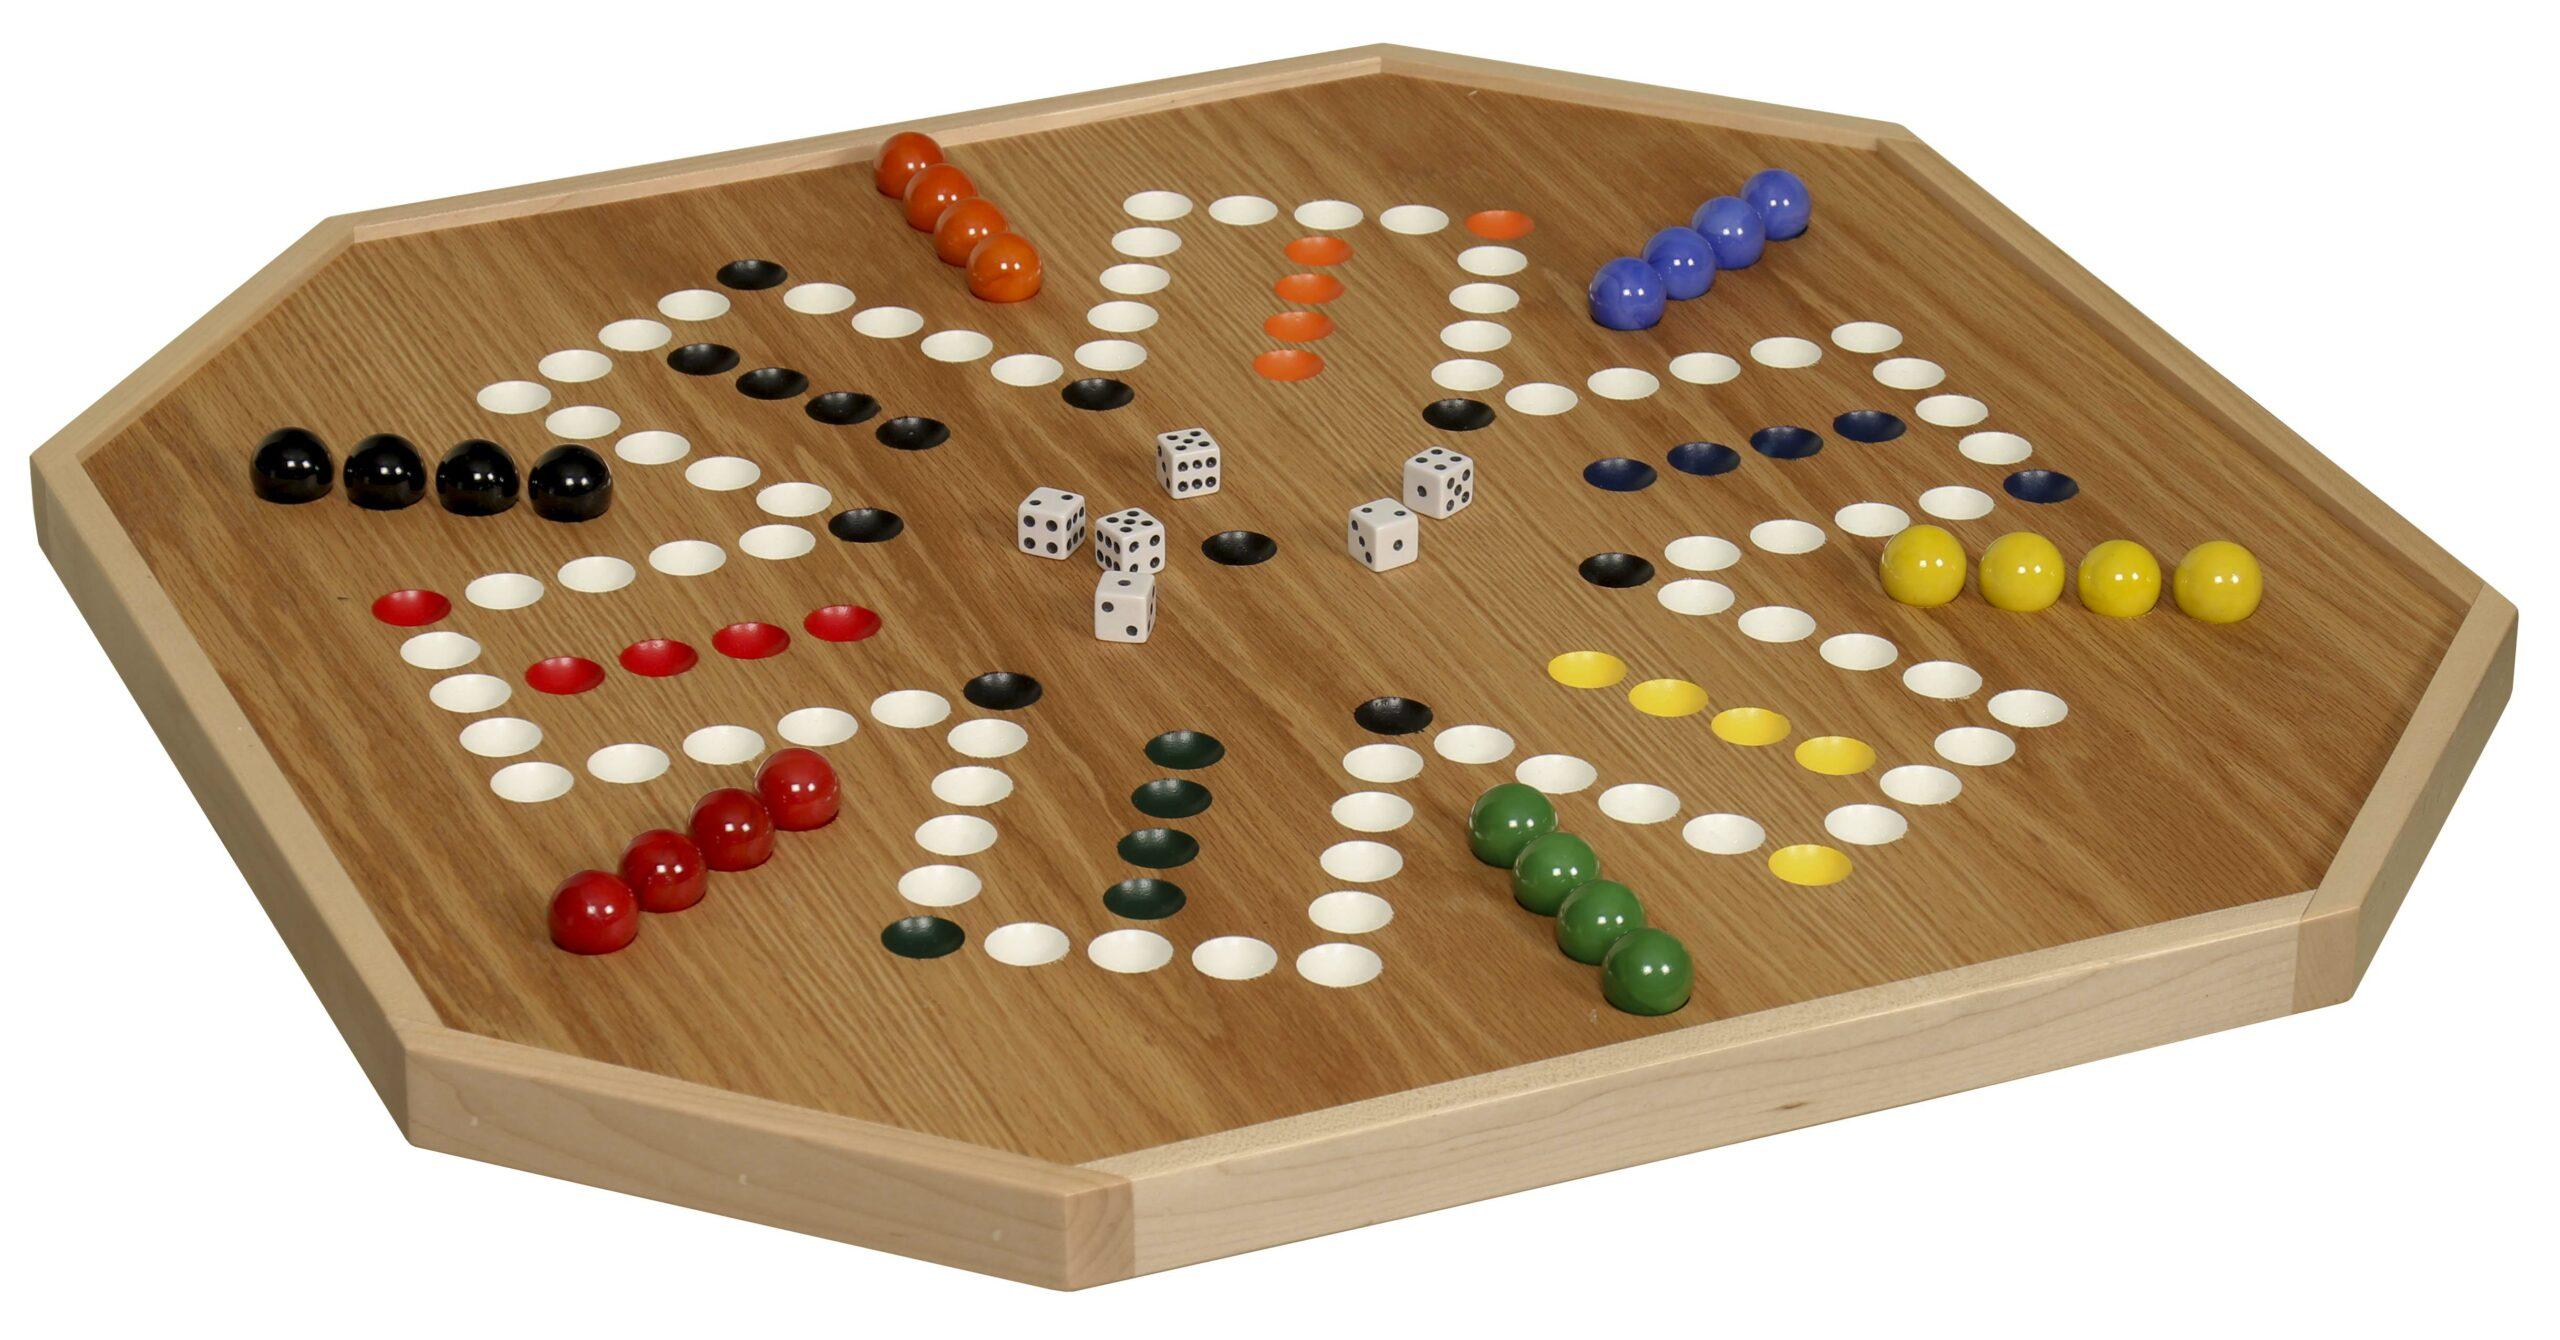 A070719 Aggravation Game set